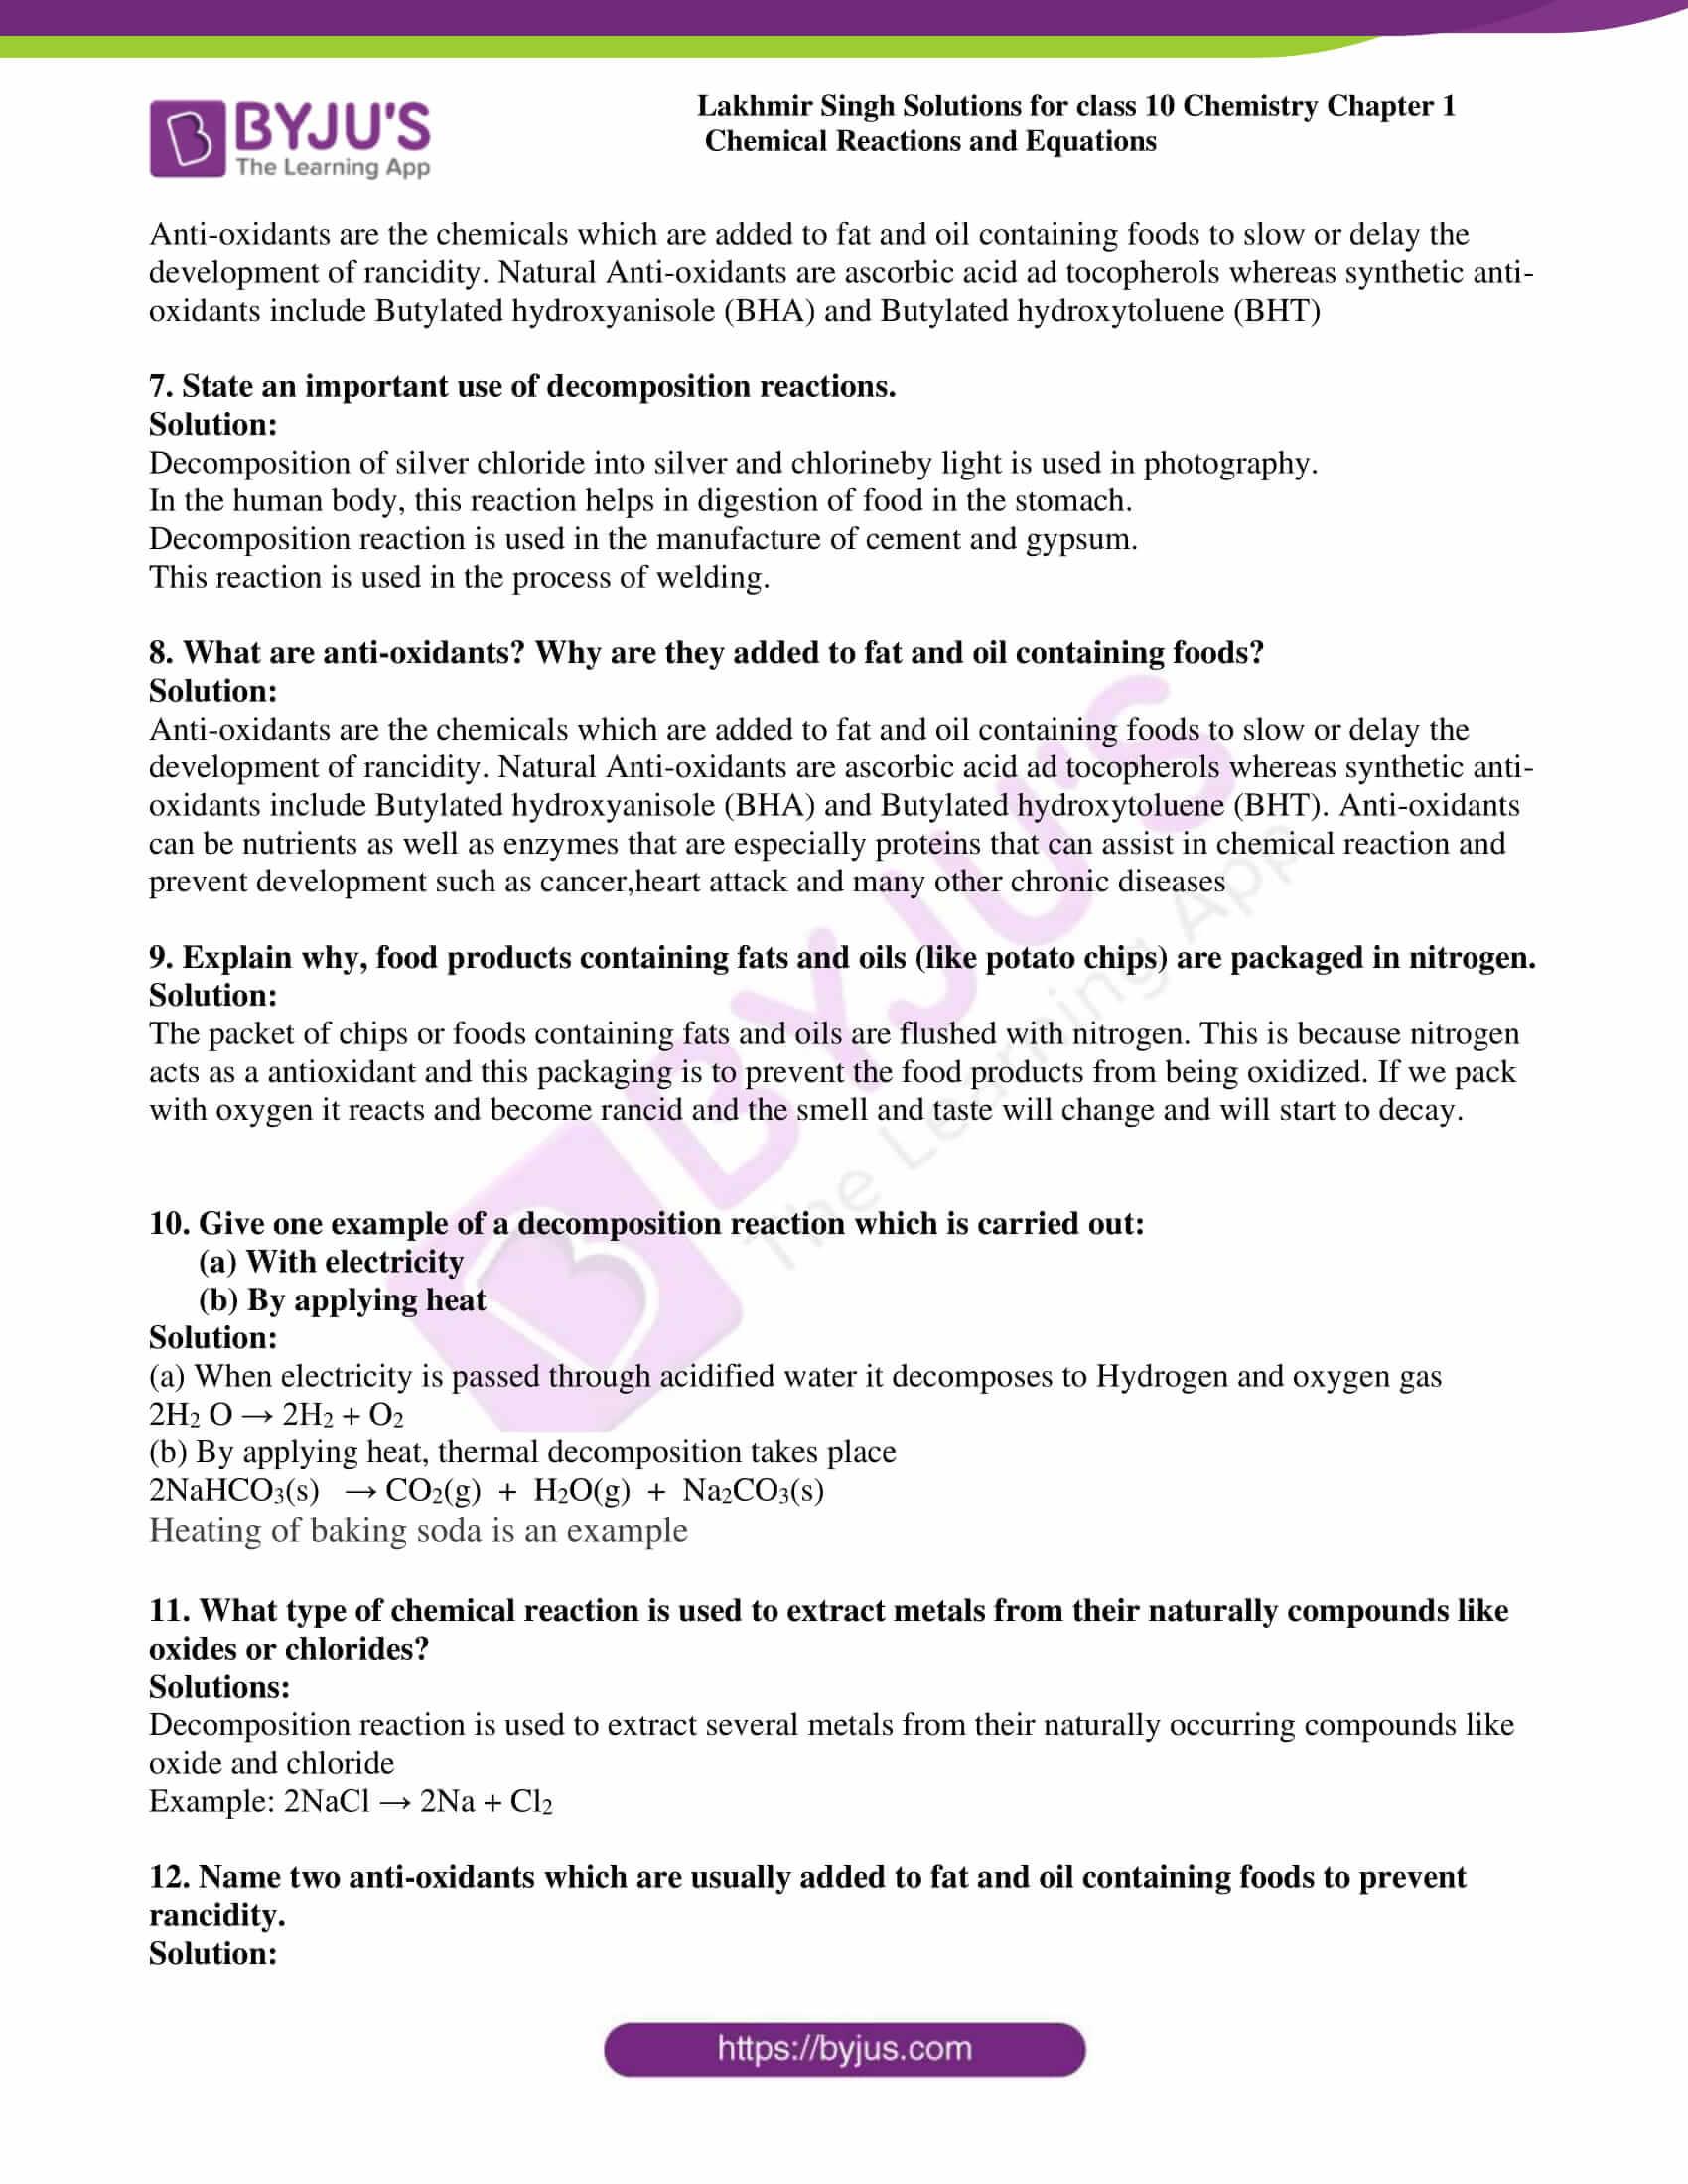 lakhmir singh sol class 10 che chapter 1 17